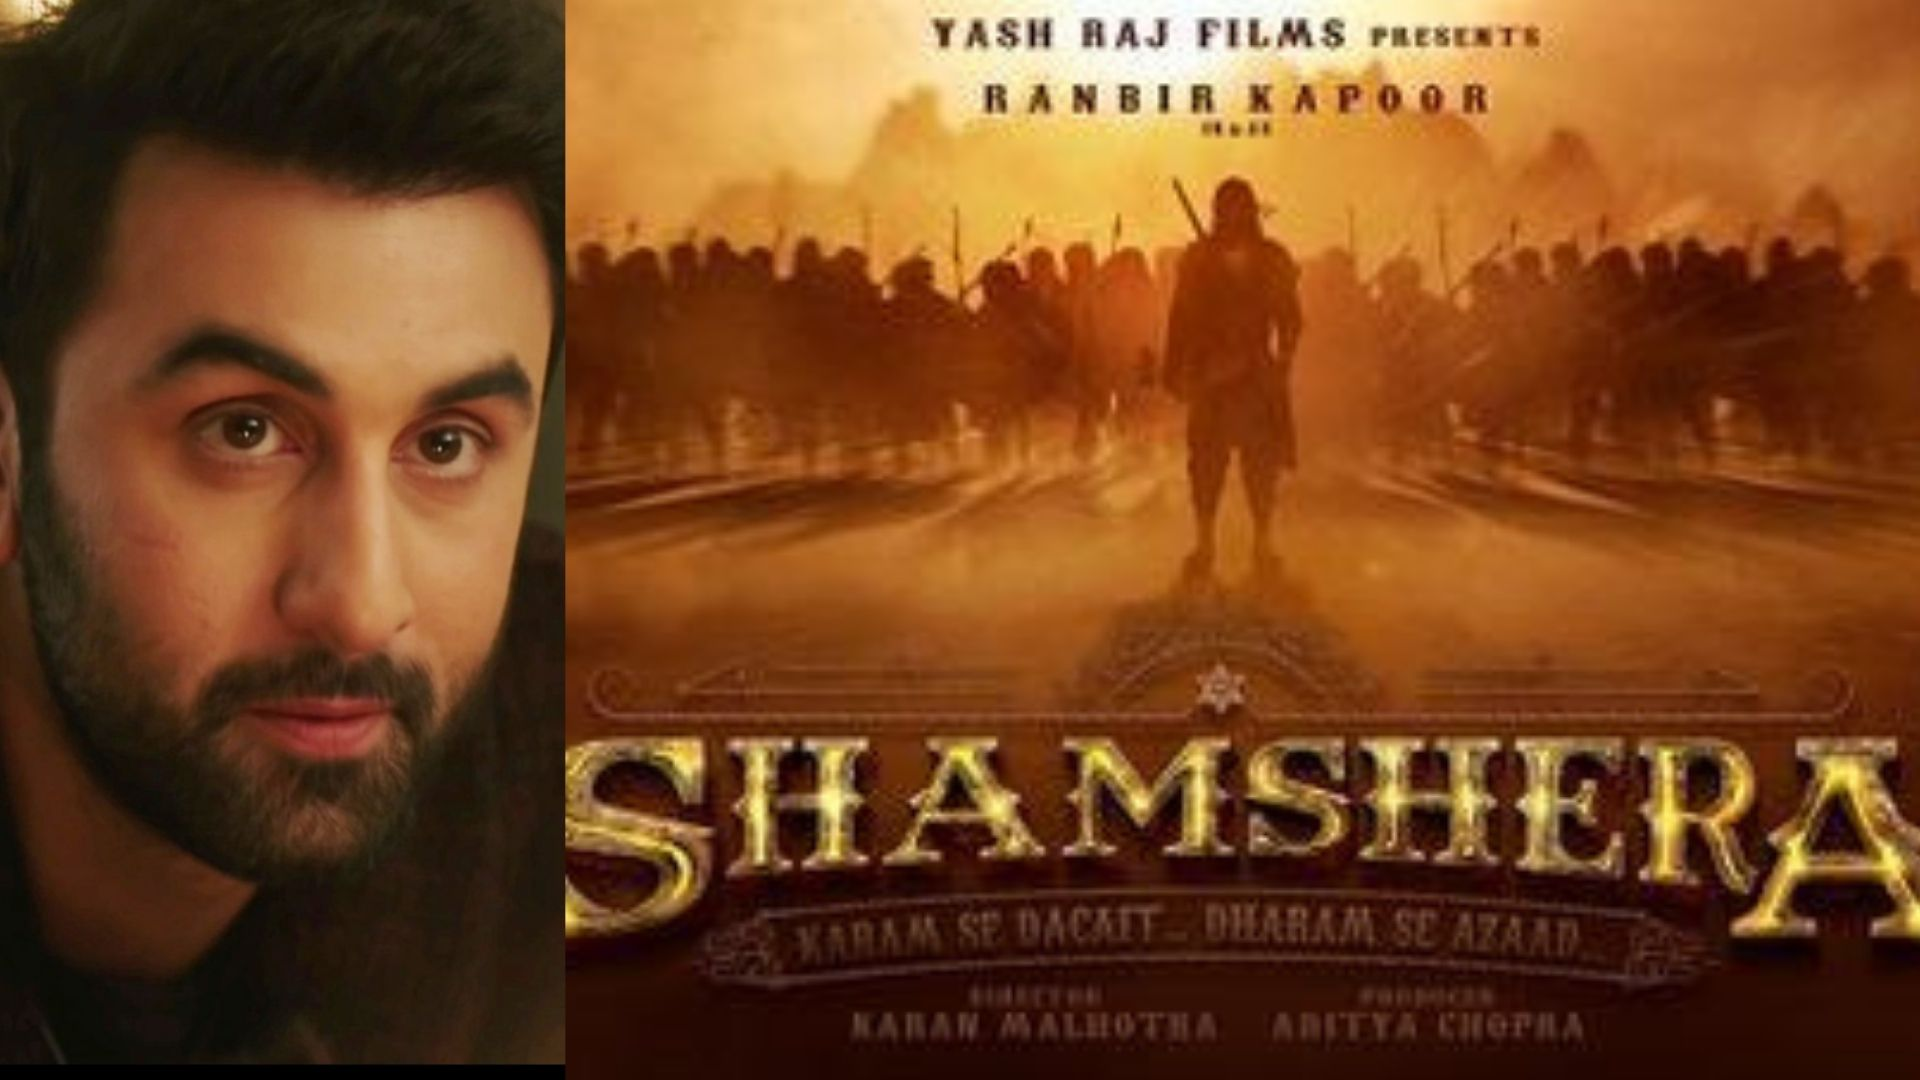 Shamshera: On Ranbir Kapoor's Birthday, Makers Drop Actor's First Look From Vaani Kapoor And Sanjay Dutt Co-starrer